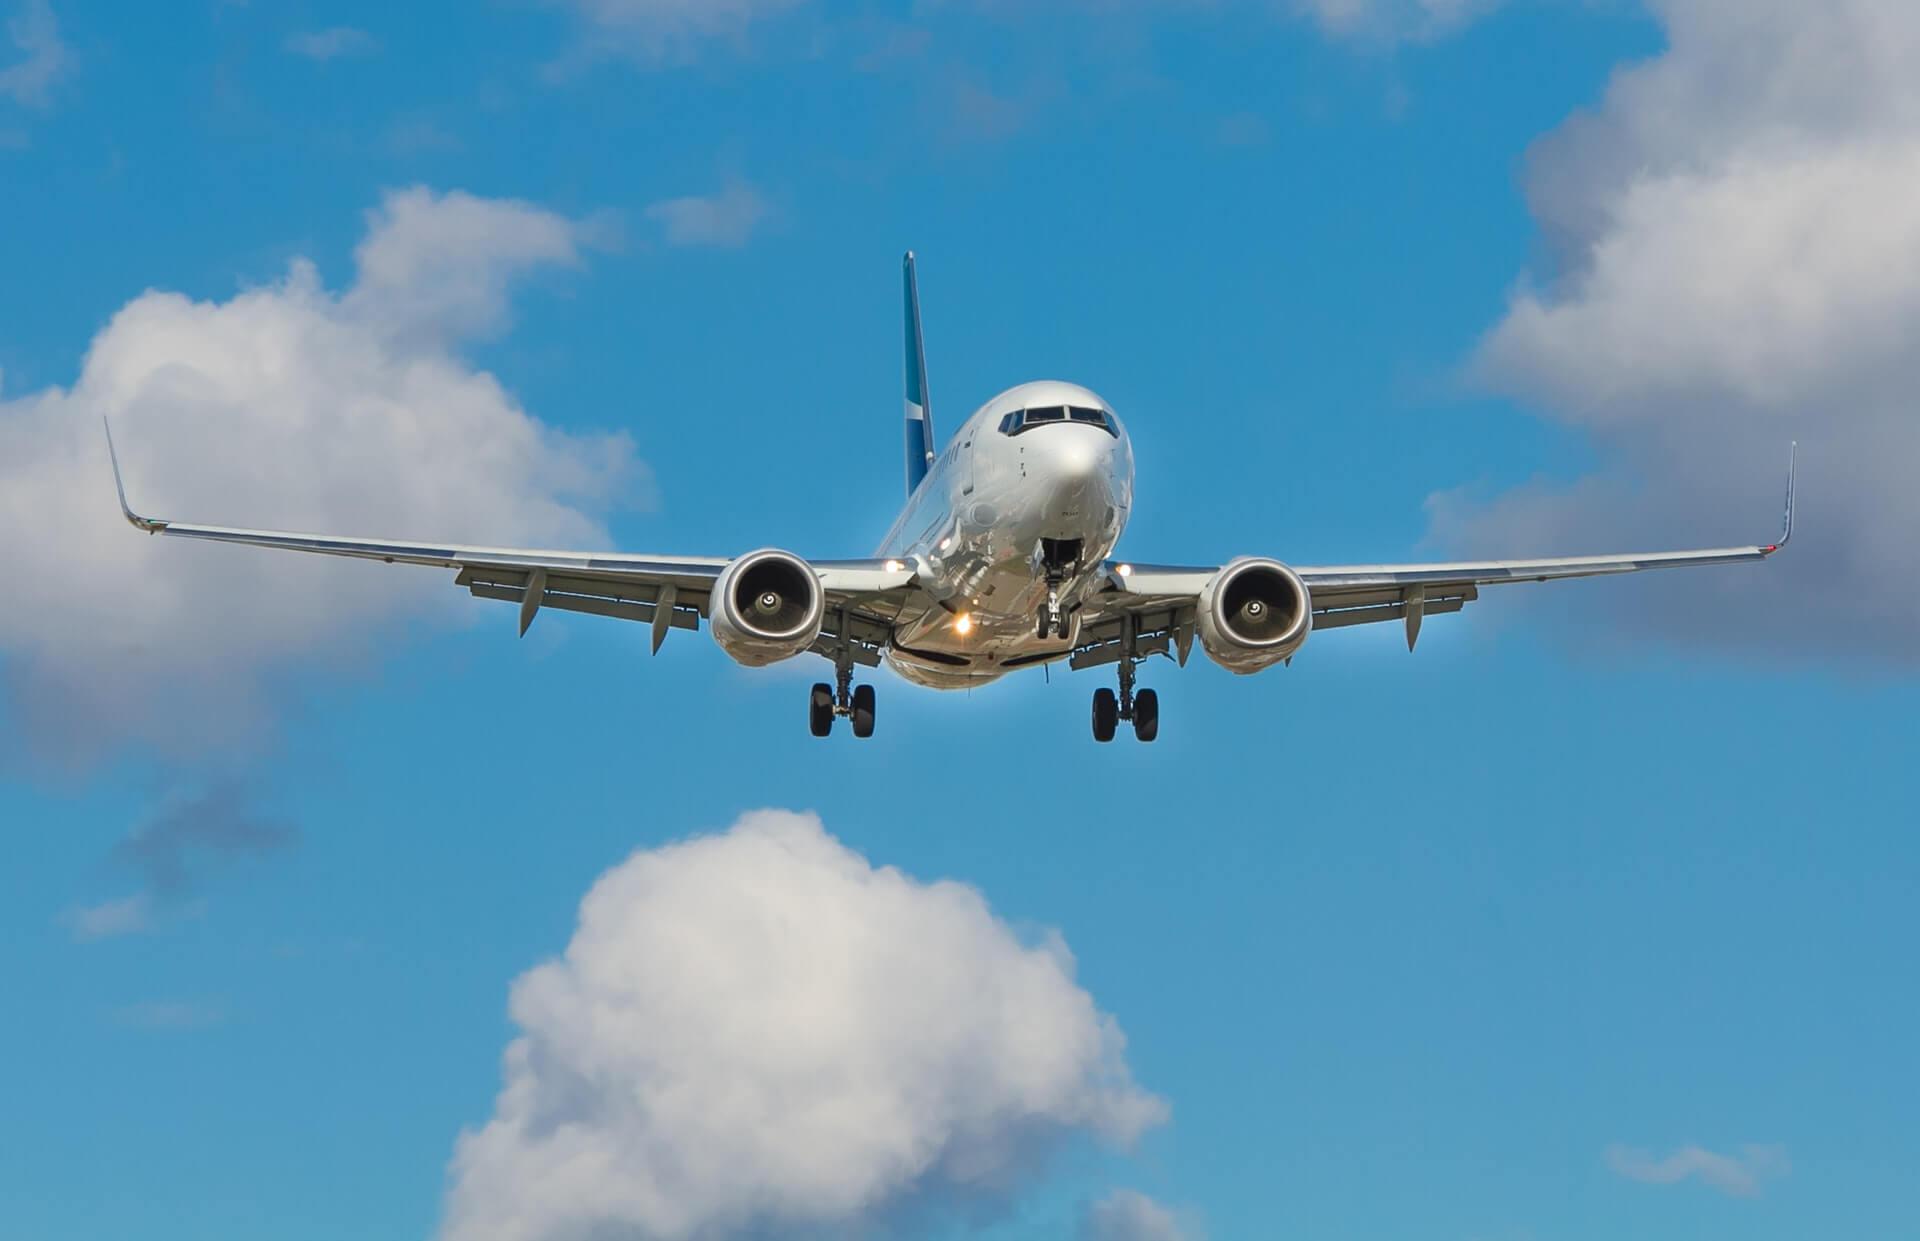 Flight Ban during Covid-19